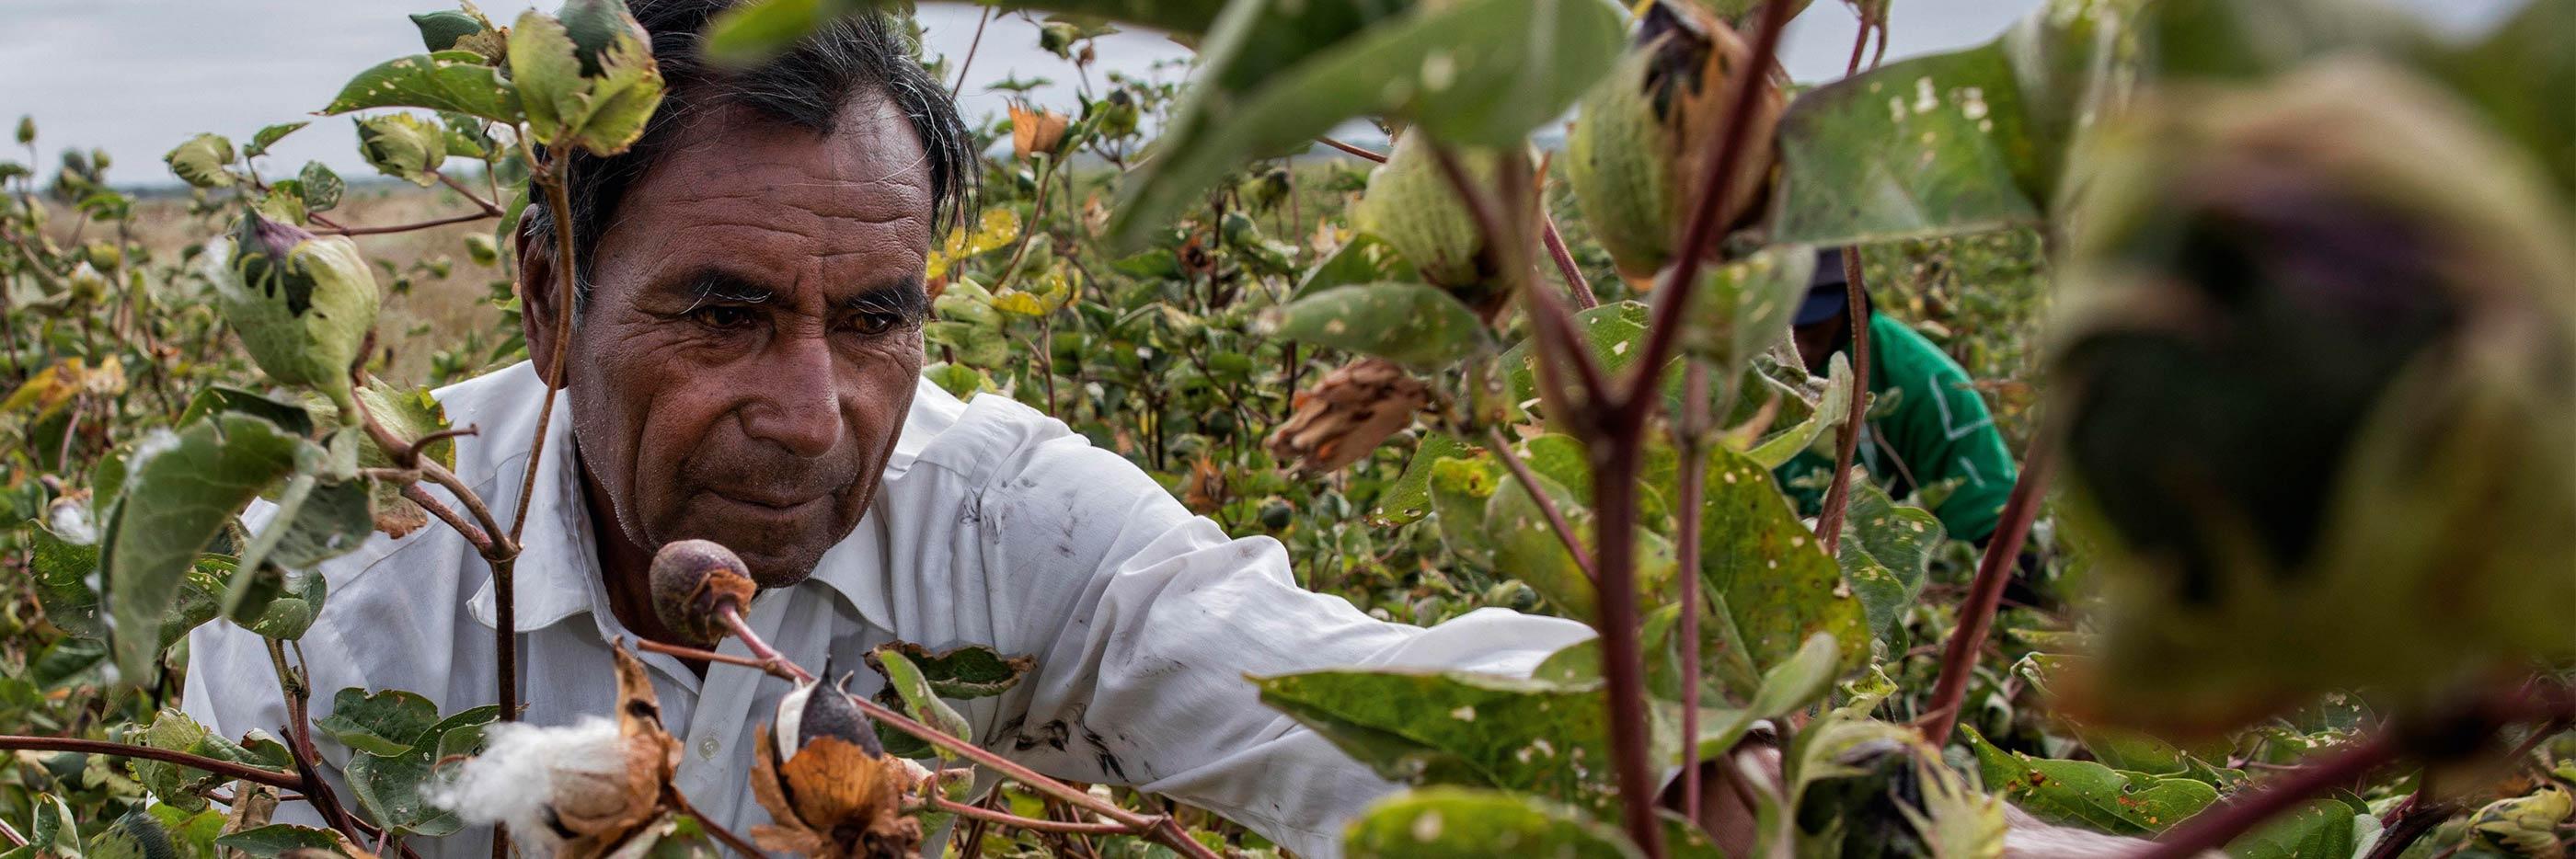 Cotton picker in Peru harvests the ripe cotton flowers | mey®